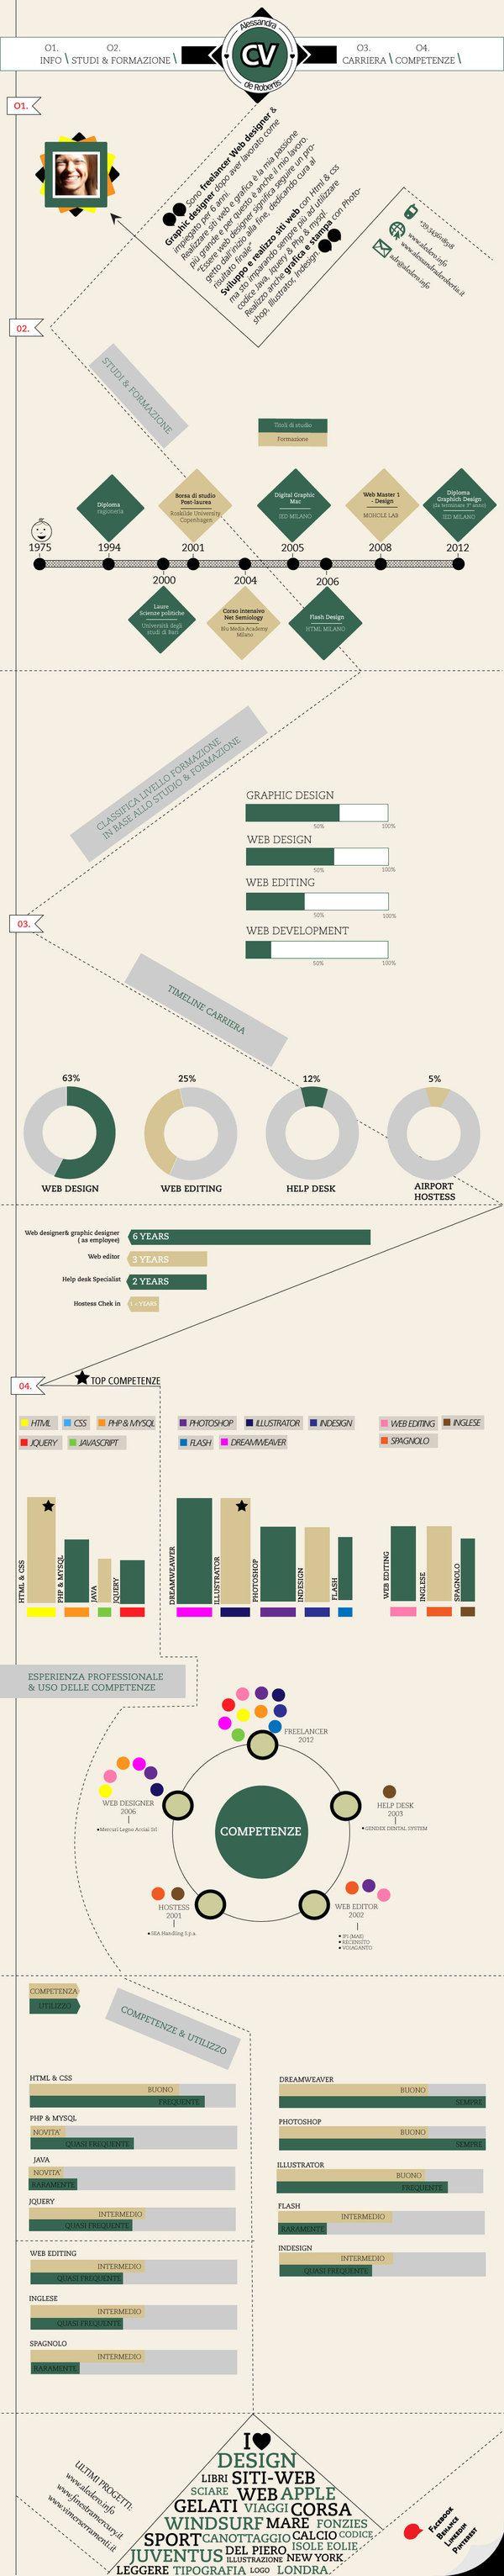 Infographic by Alessandra de Robertis, via Behance